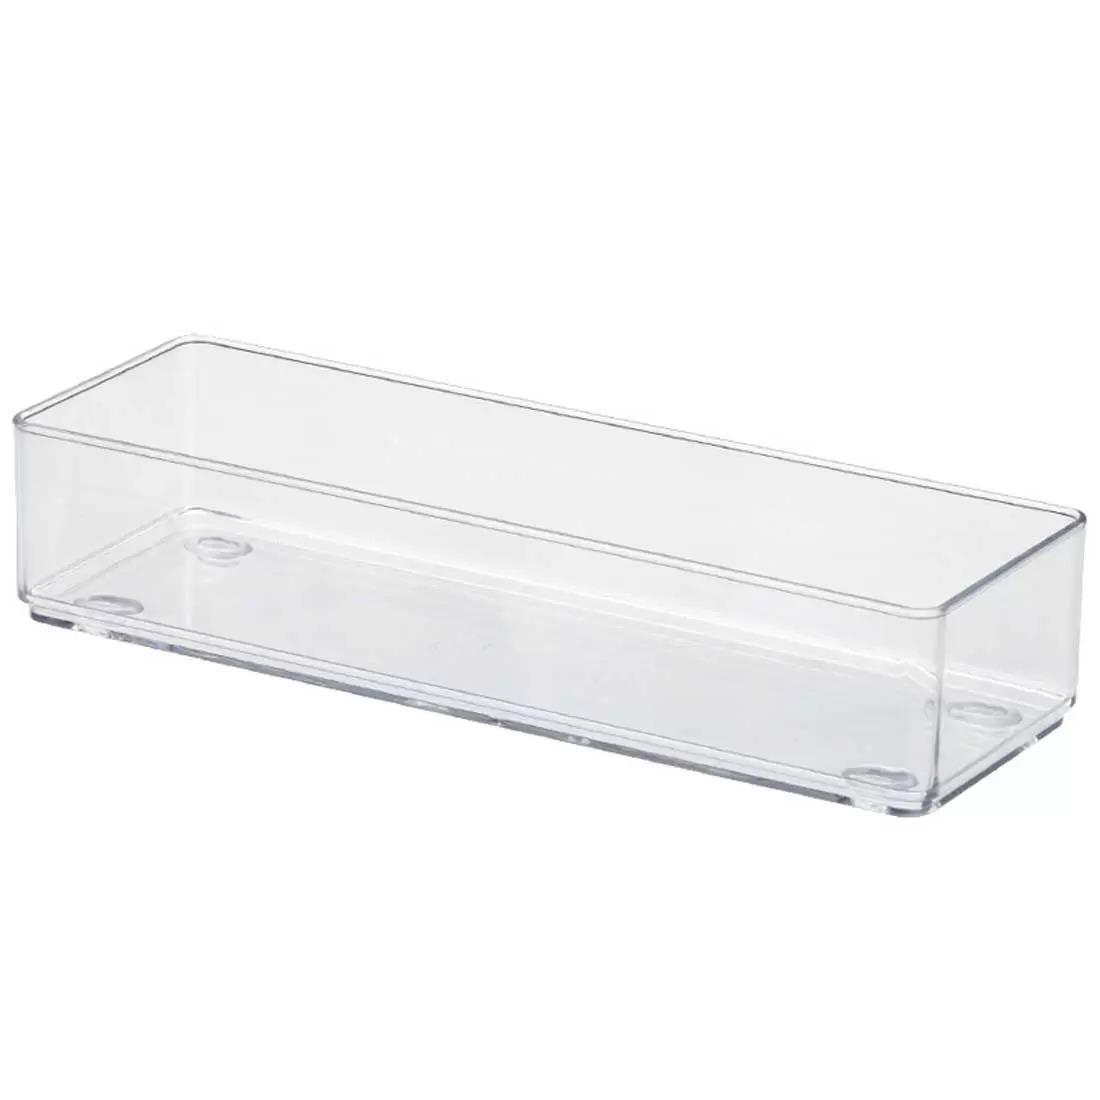 Organizador de gavetas Cristal 800mls base antiderrapante - Arthi